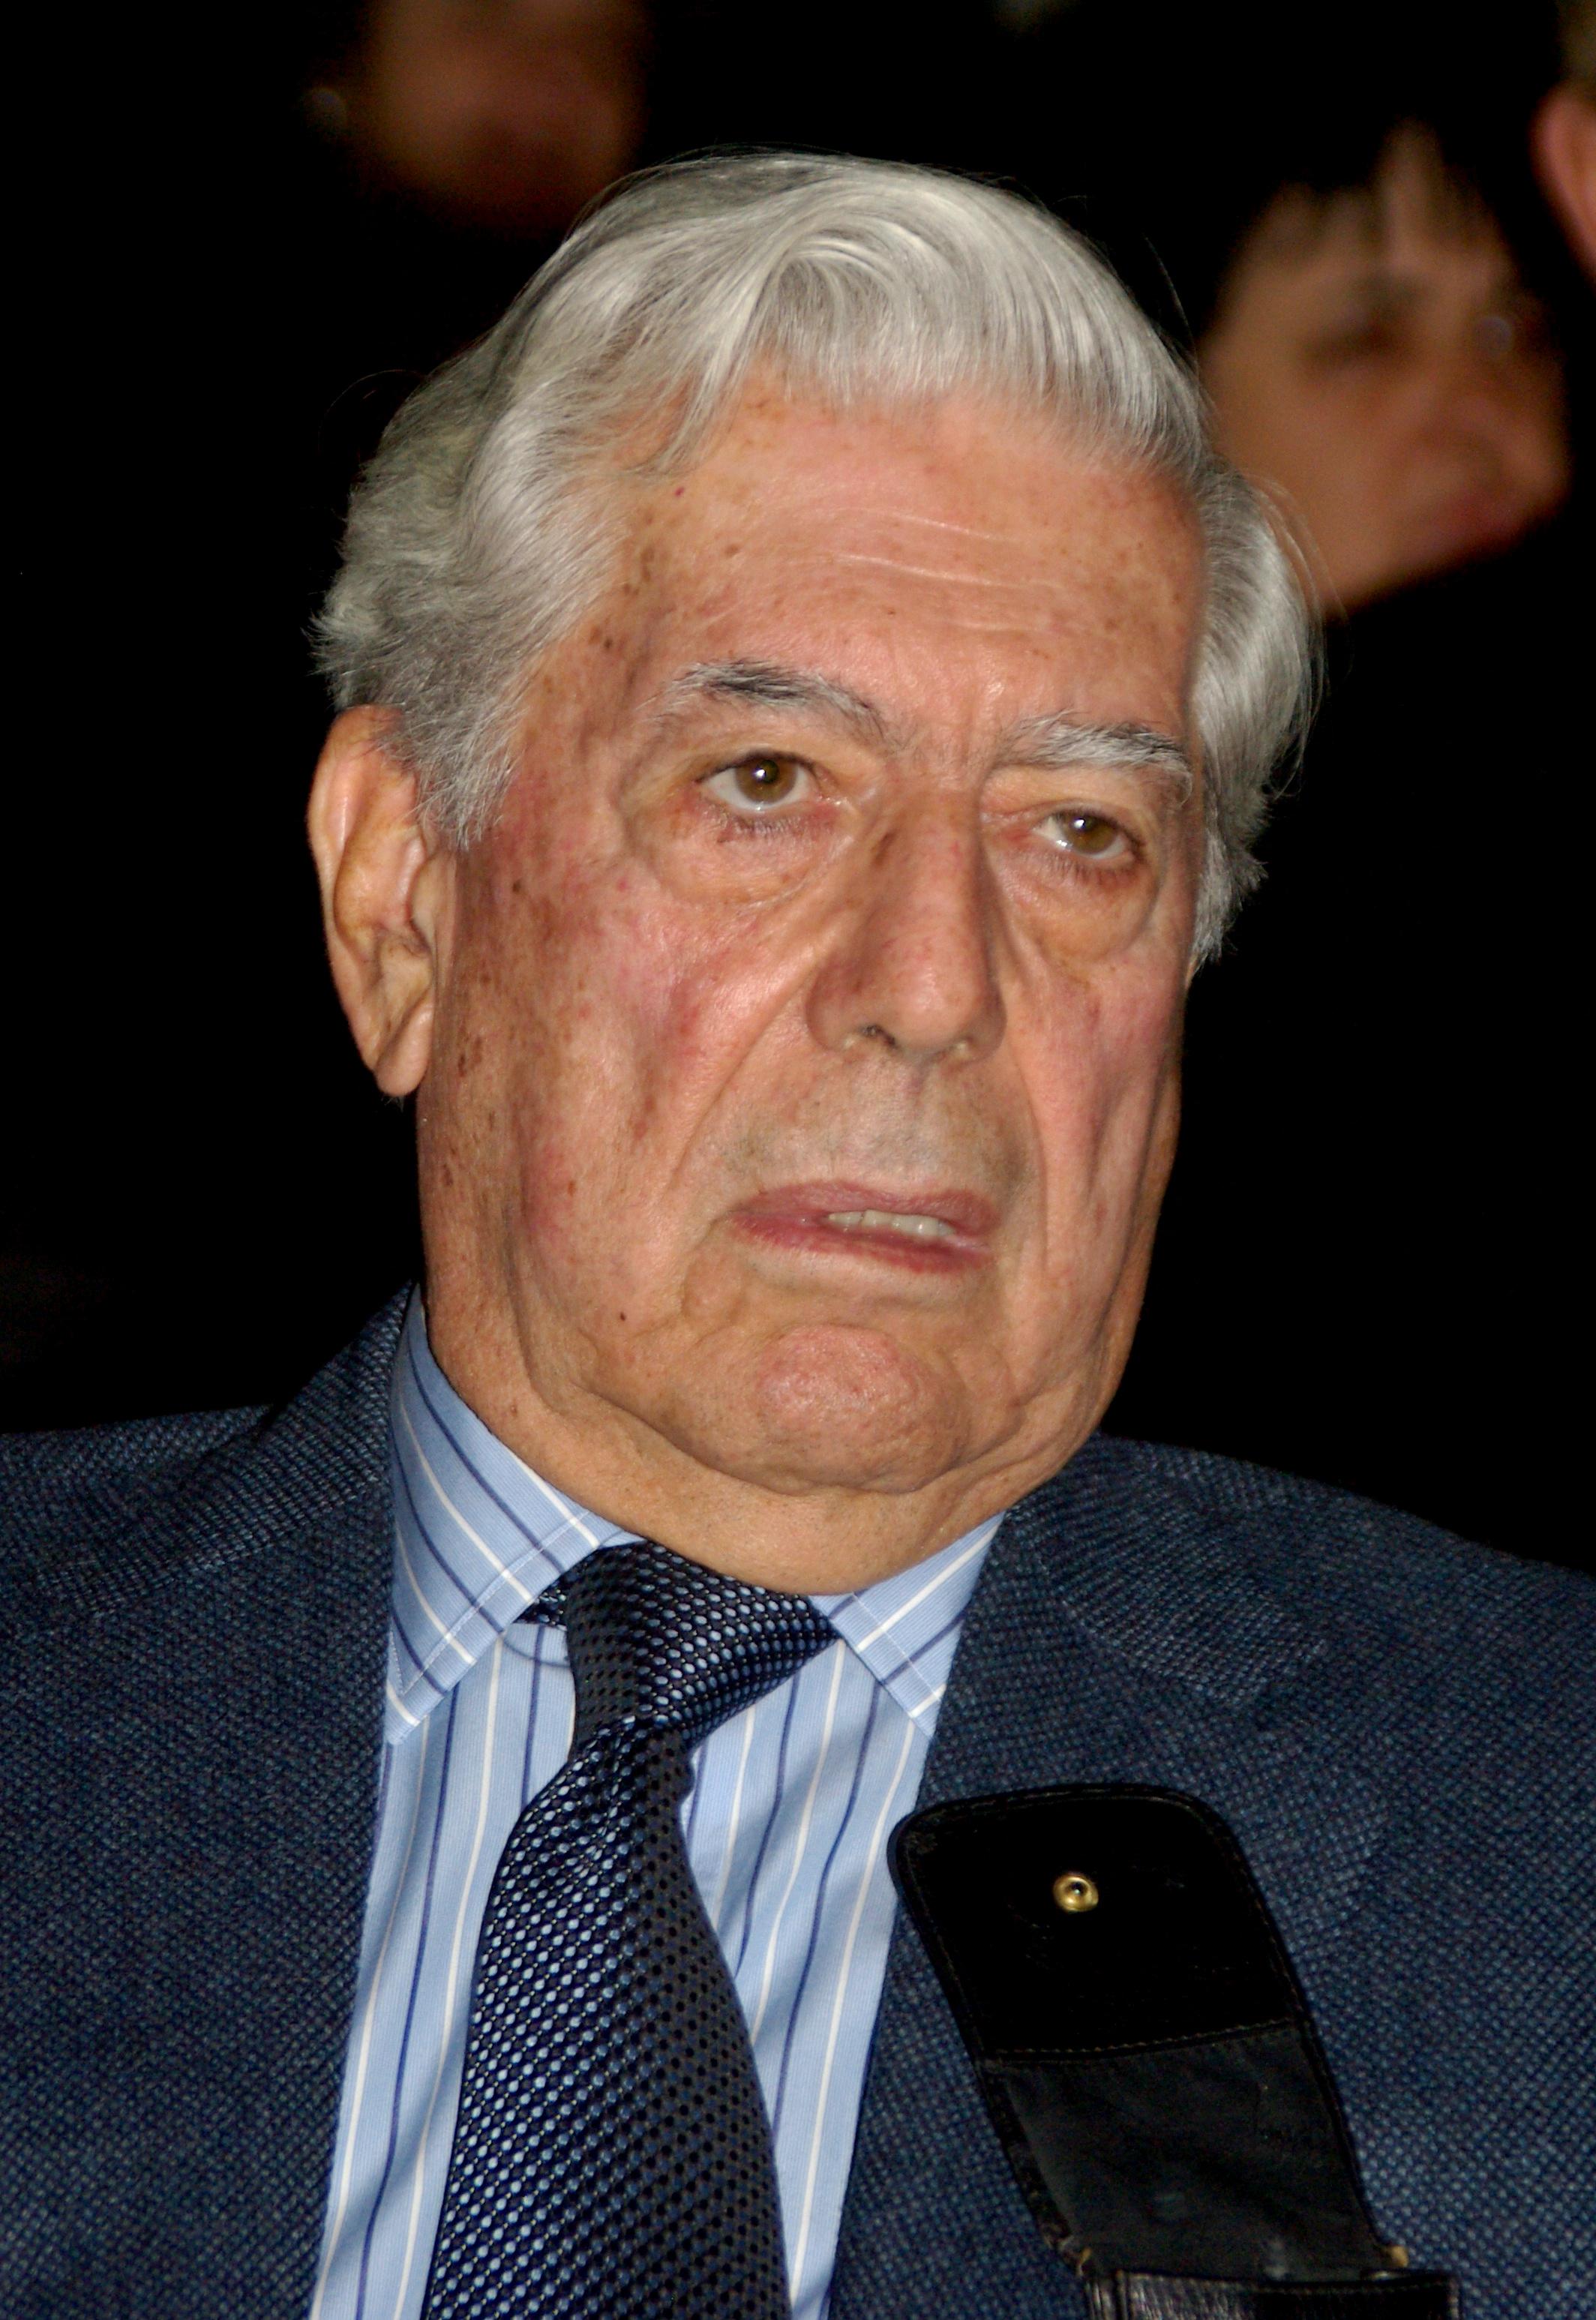 Mario Vargas Llosa in Madrid, 2012